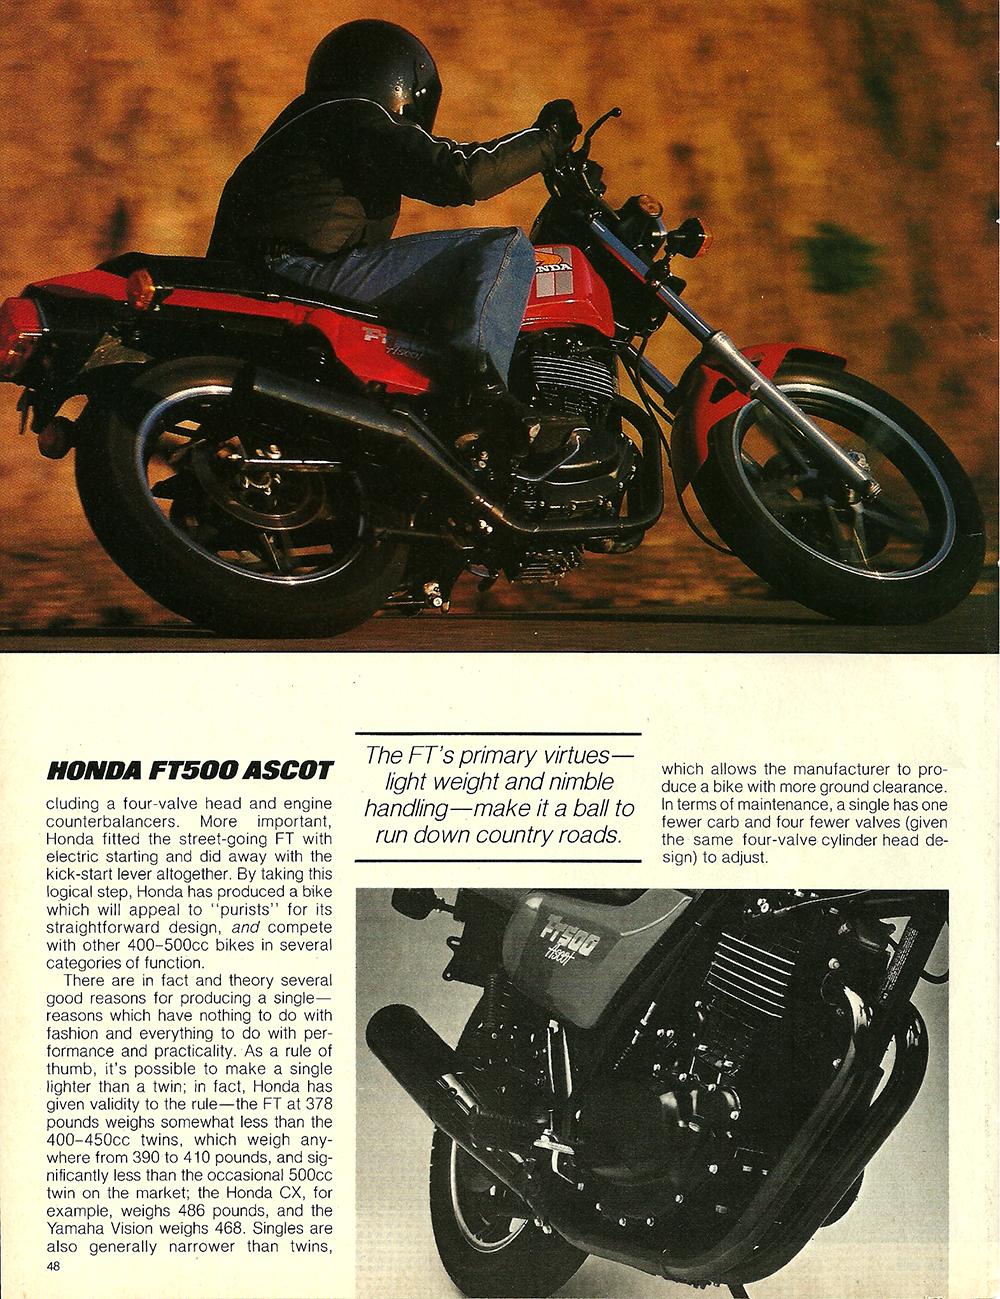 1982 Honda FT500 Ascot road test 2 03.jpg